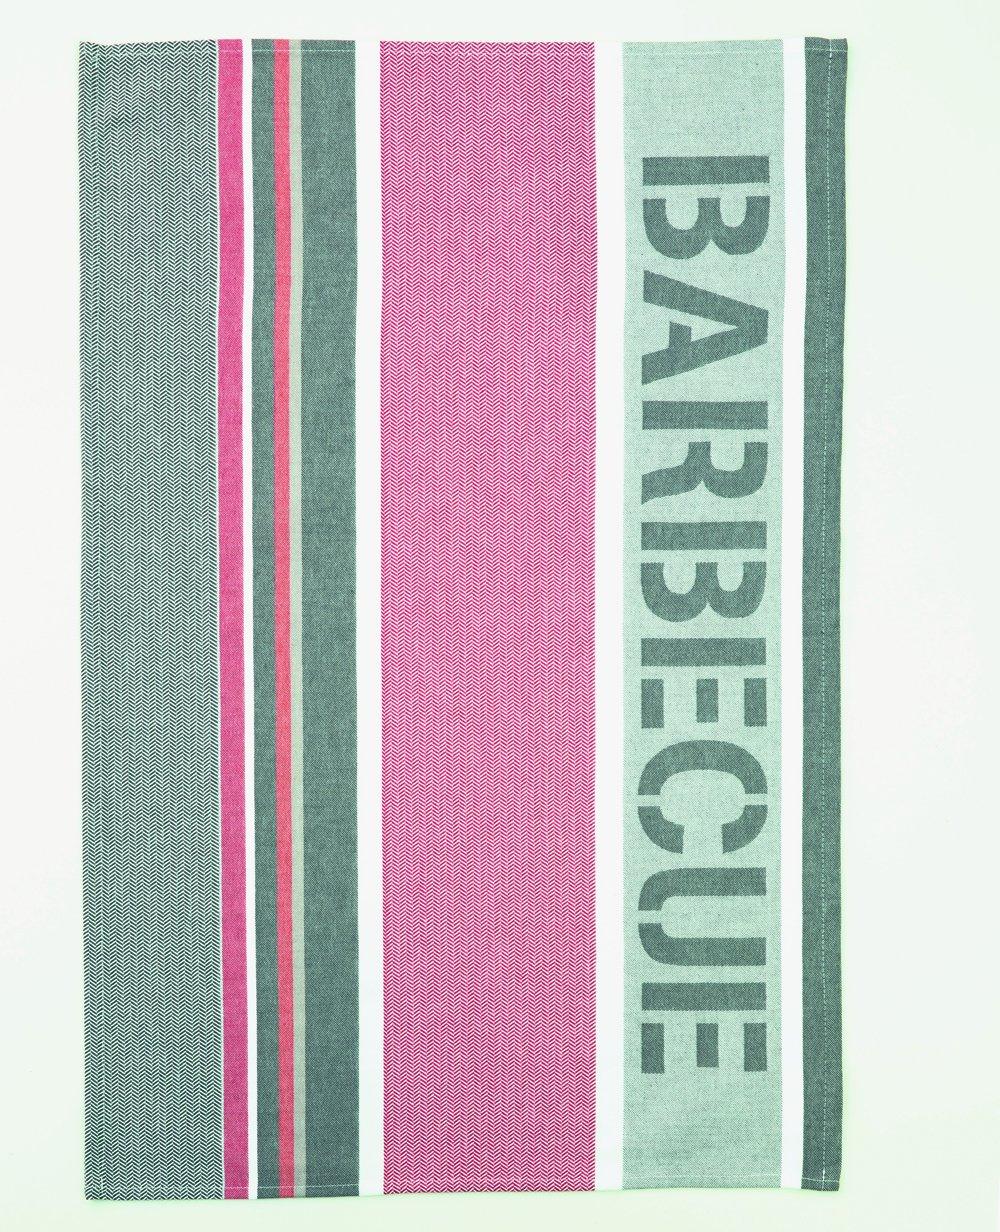 Coucke Barbecue tea towel #1